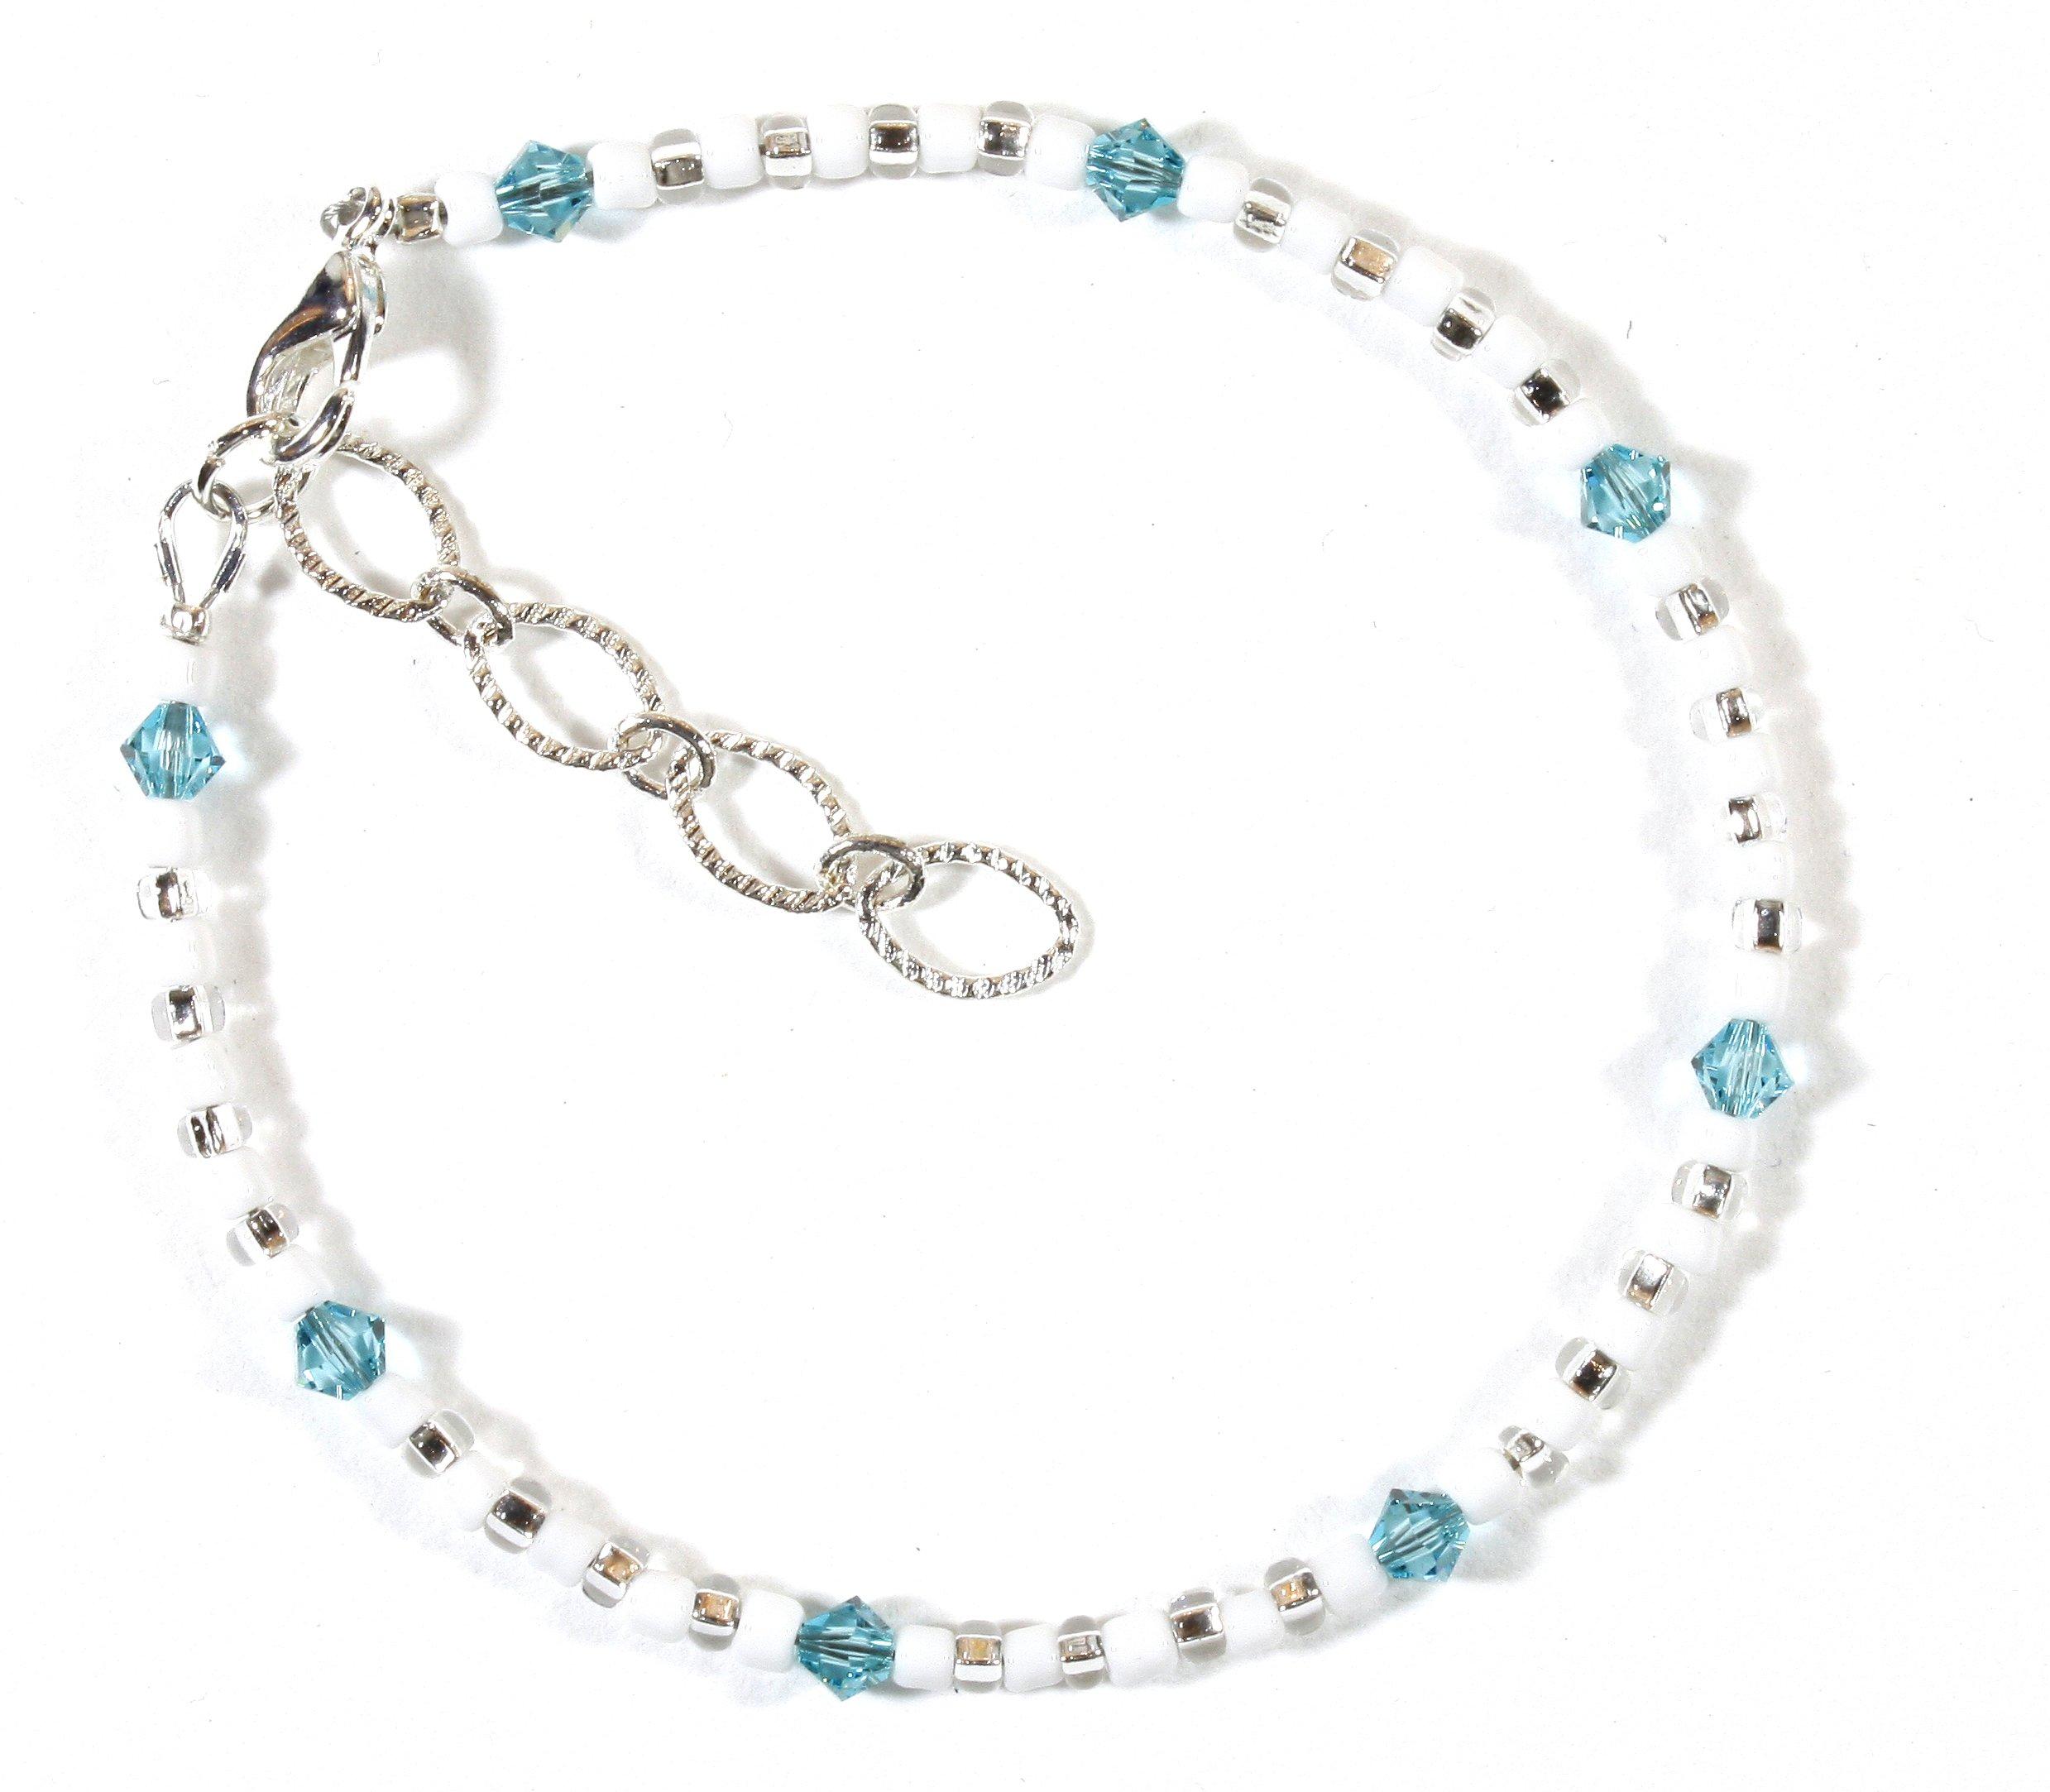 Style-ARThouse ''Take Me To the Caribbean'' Bracelet with Aqua Blue Swarovski Crystals, 7.5 Inches